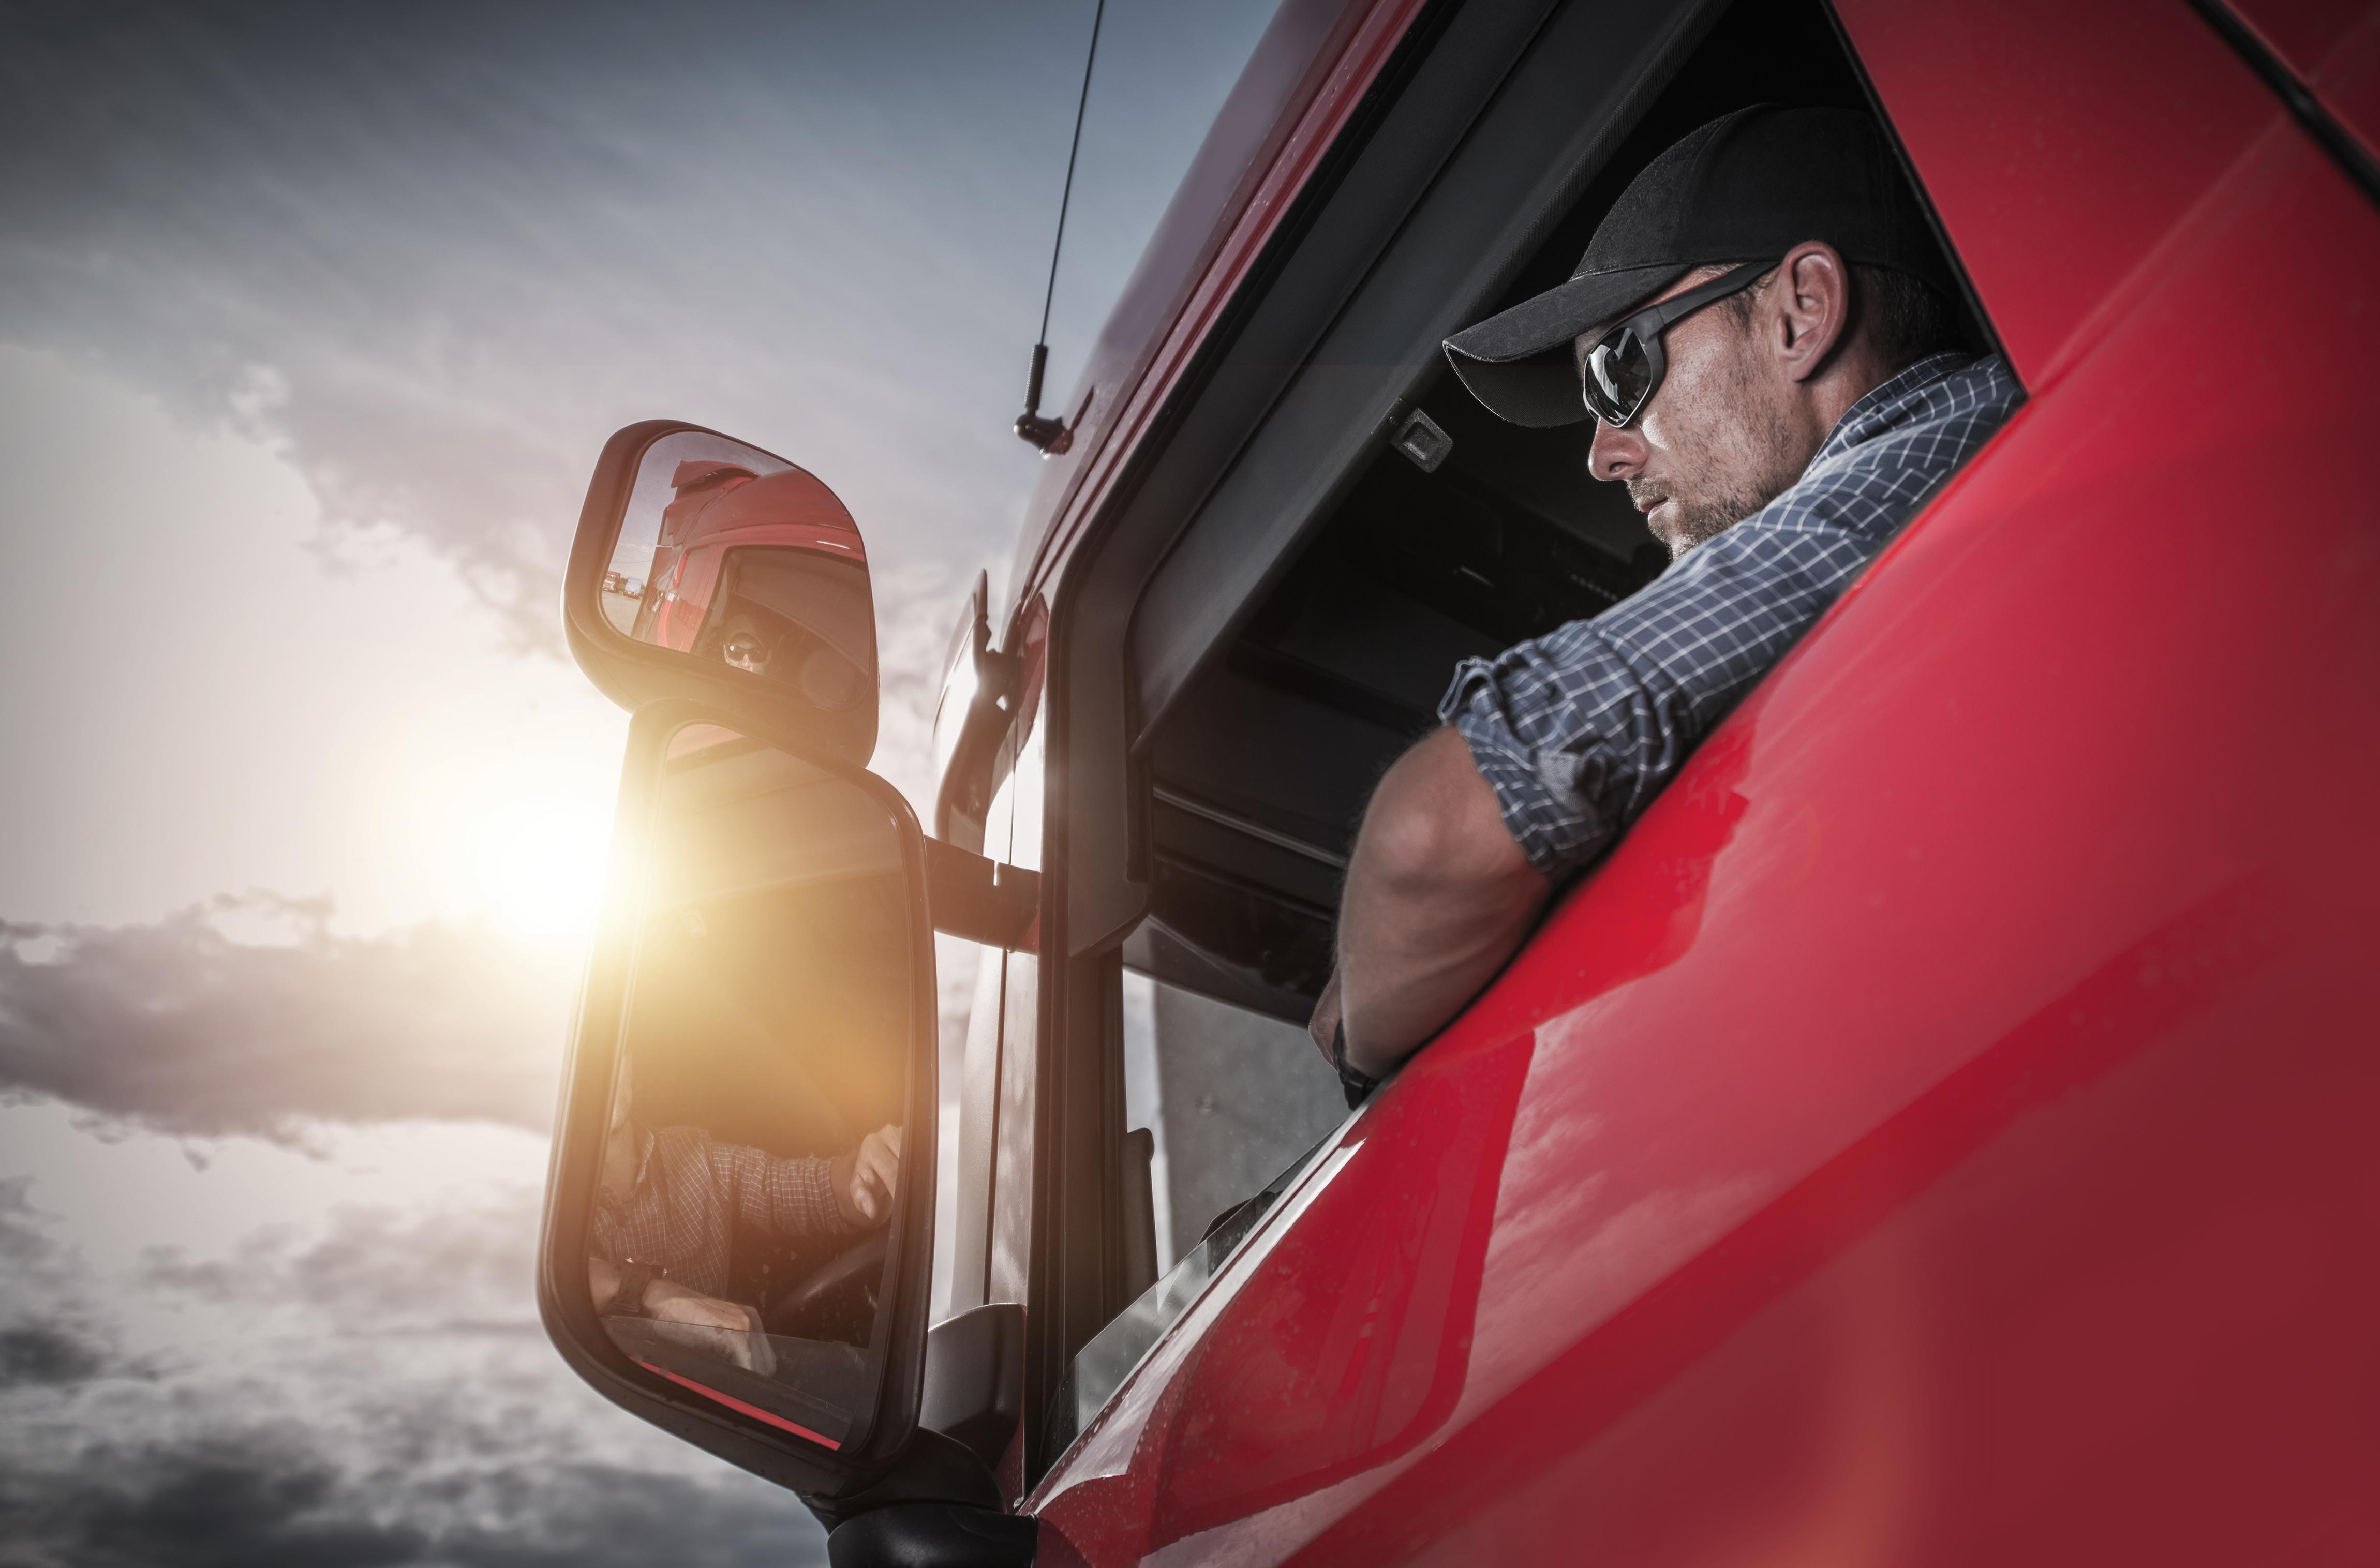 Cleveland truck driver